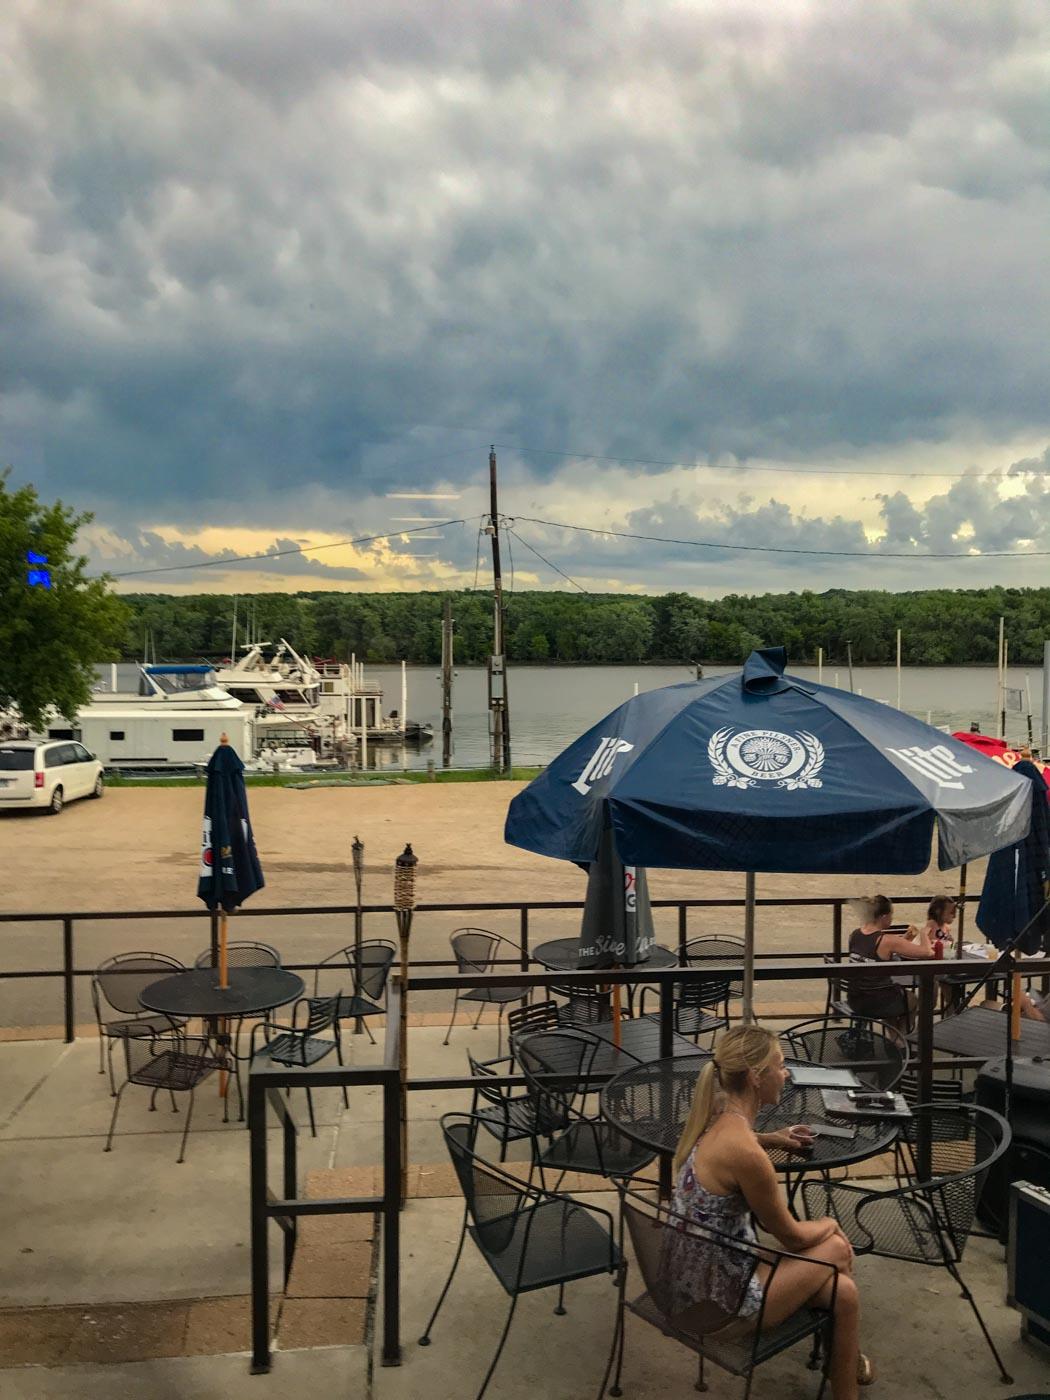 The Mississippi!